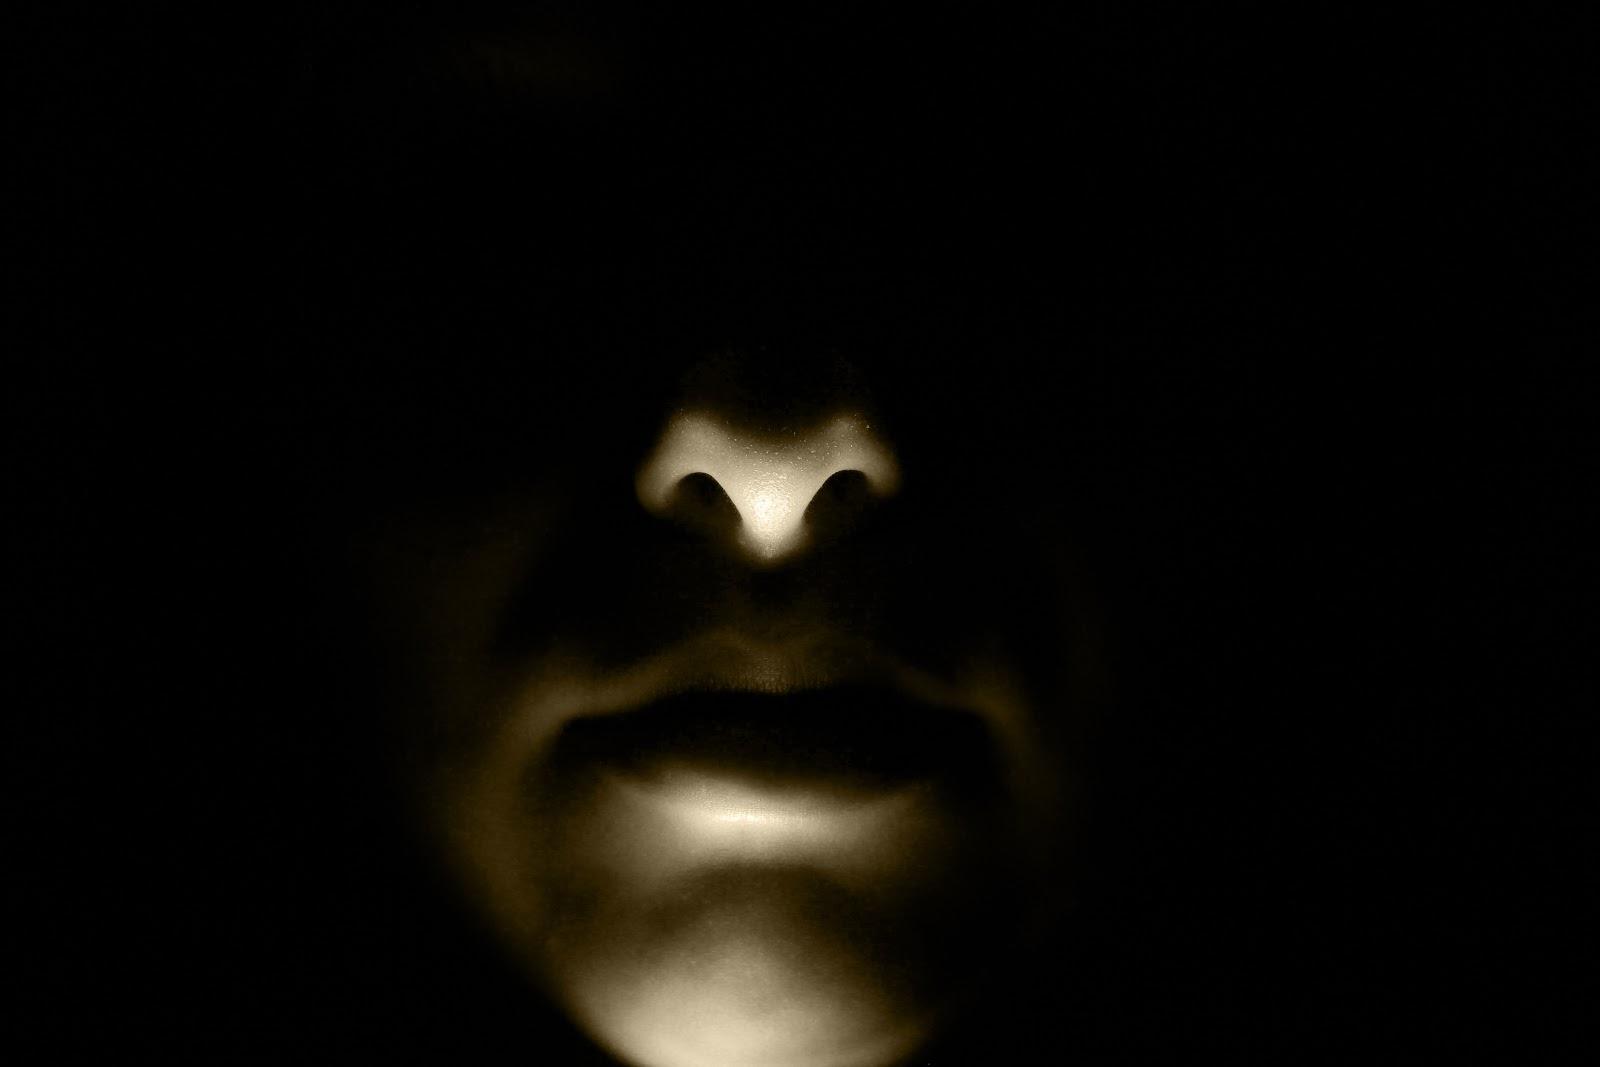 rop digital photography 2012: low key lighting